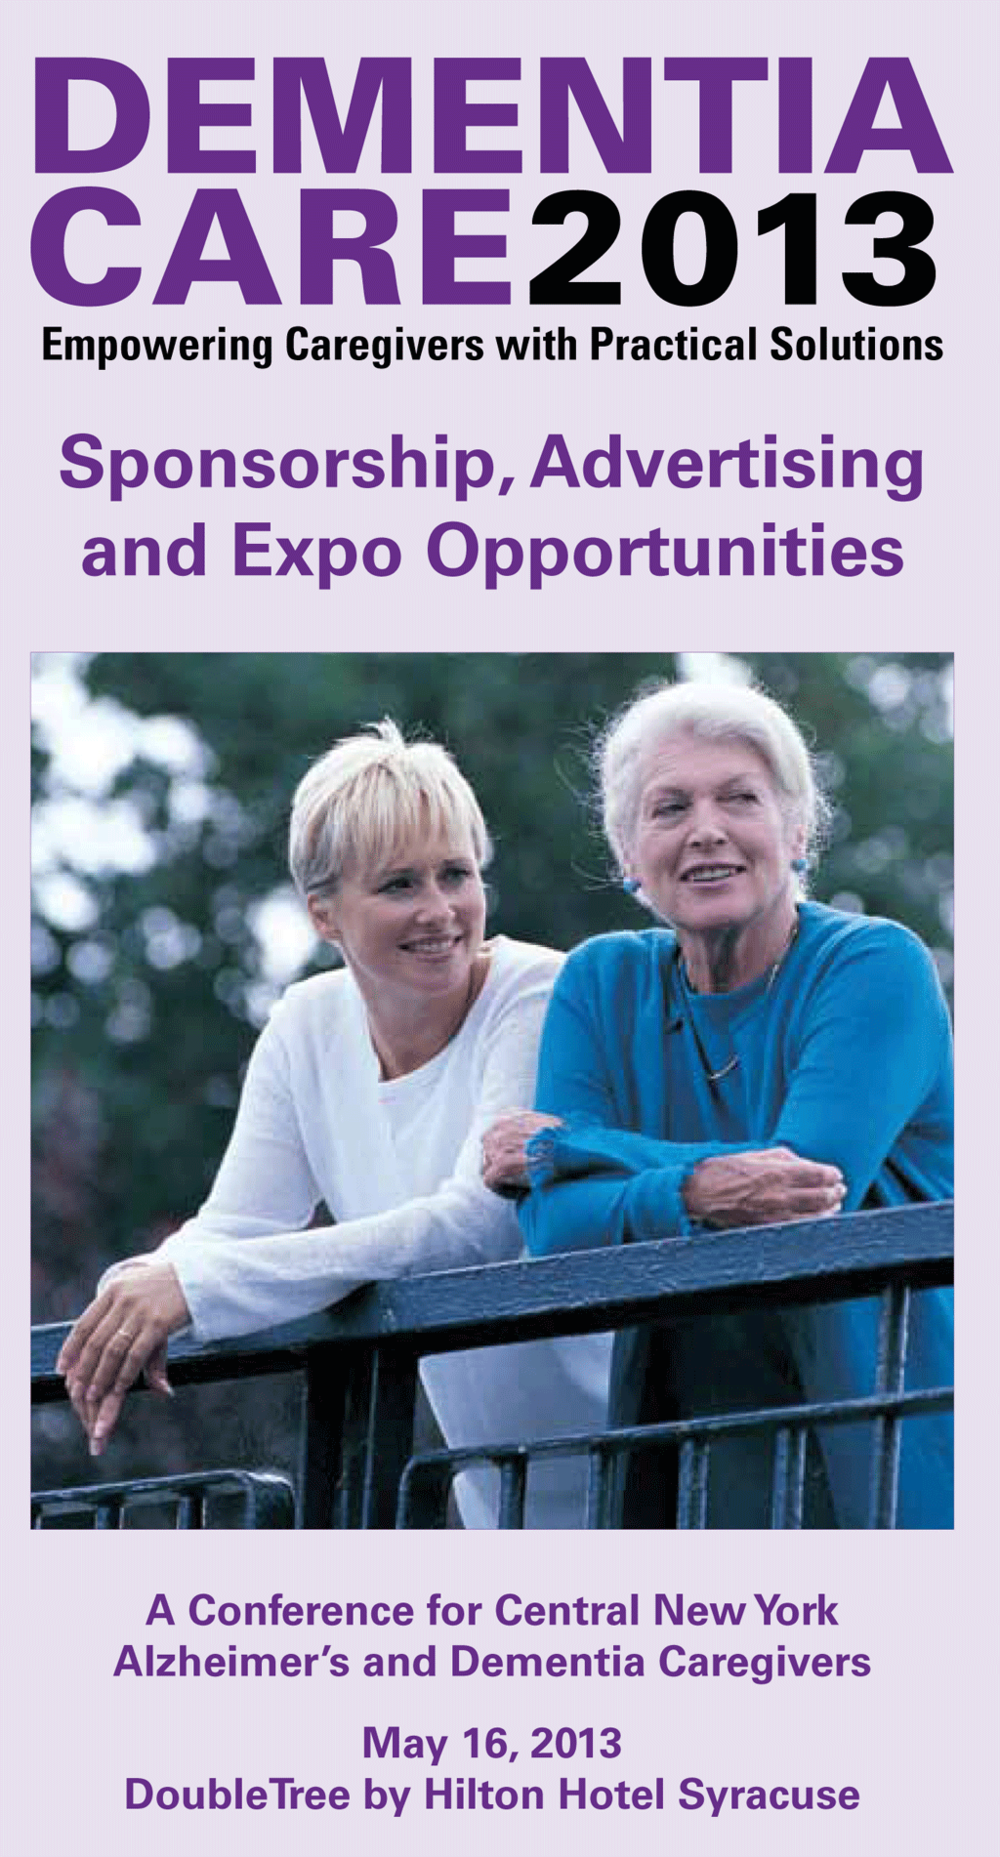 DEMENTIACARE2013 Sponsorship Brochure